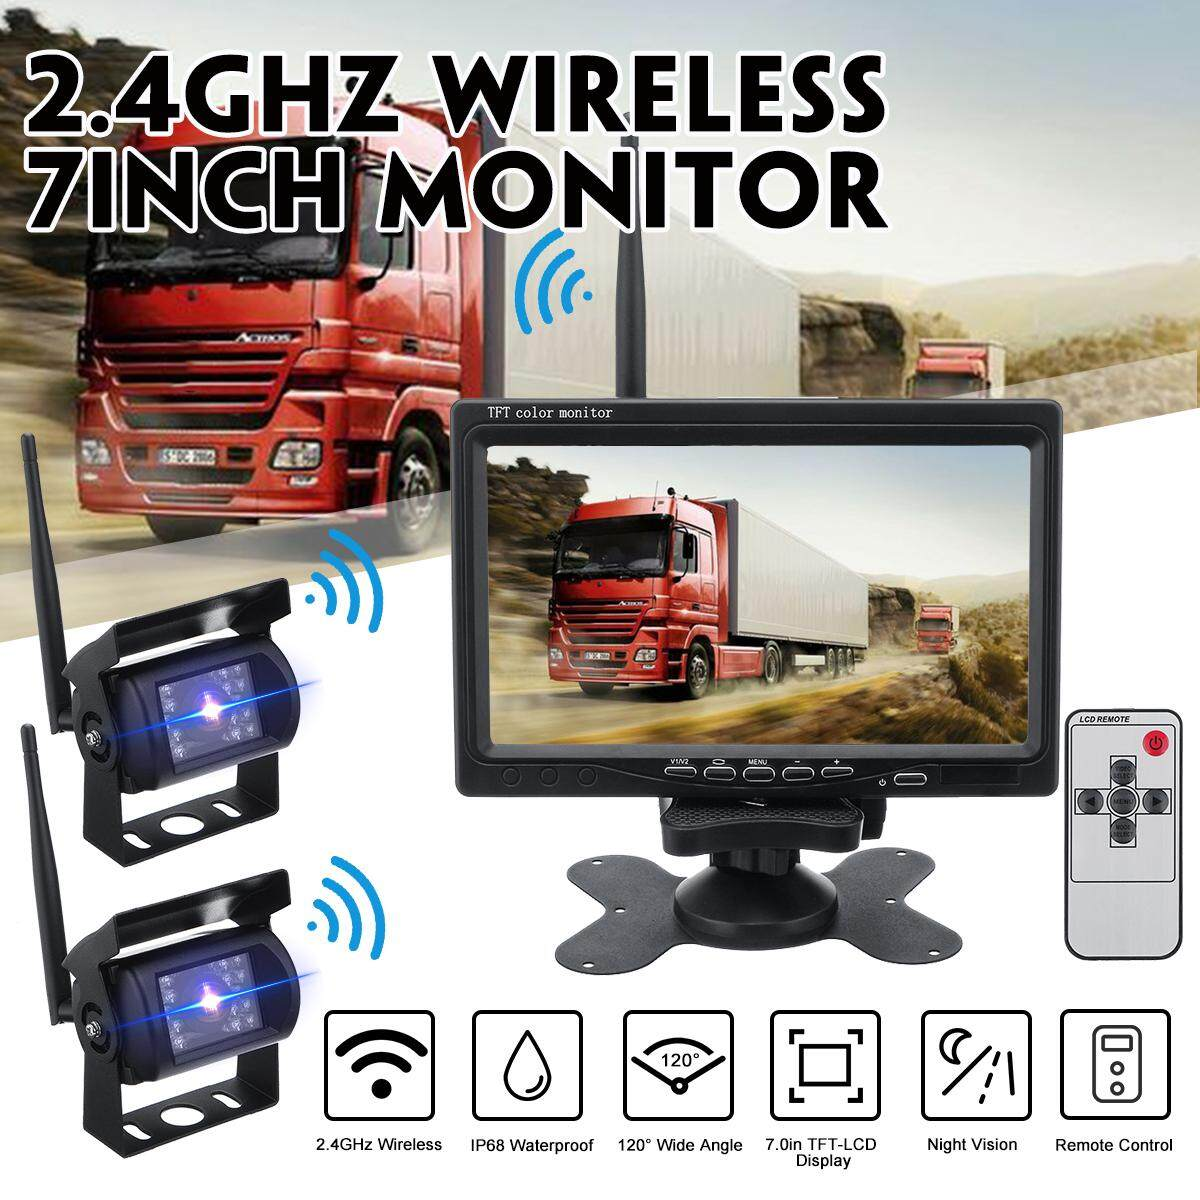 [With Dual Cameras] 7Inch Wireless Reversing Camera Car Backup Camera For Bus Truck Caravan Car Monitor Screen DC11V-32V